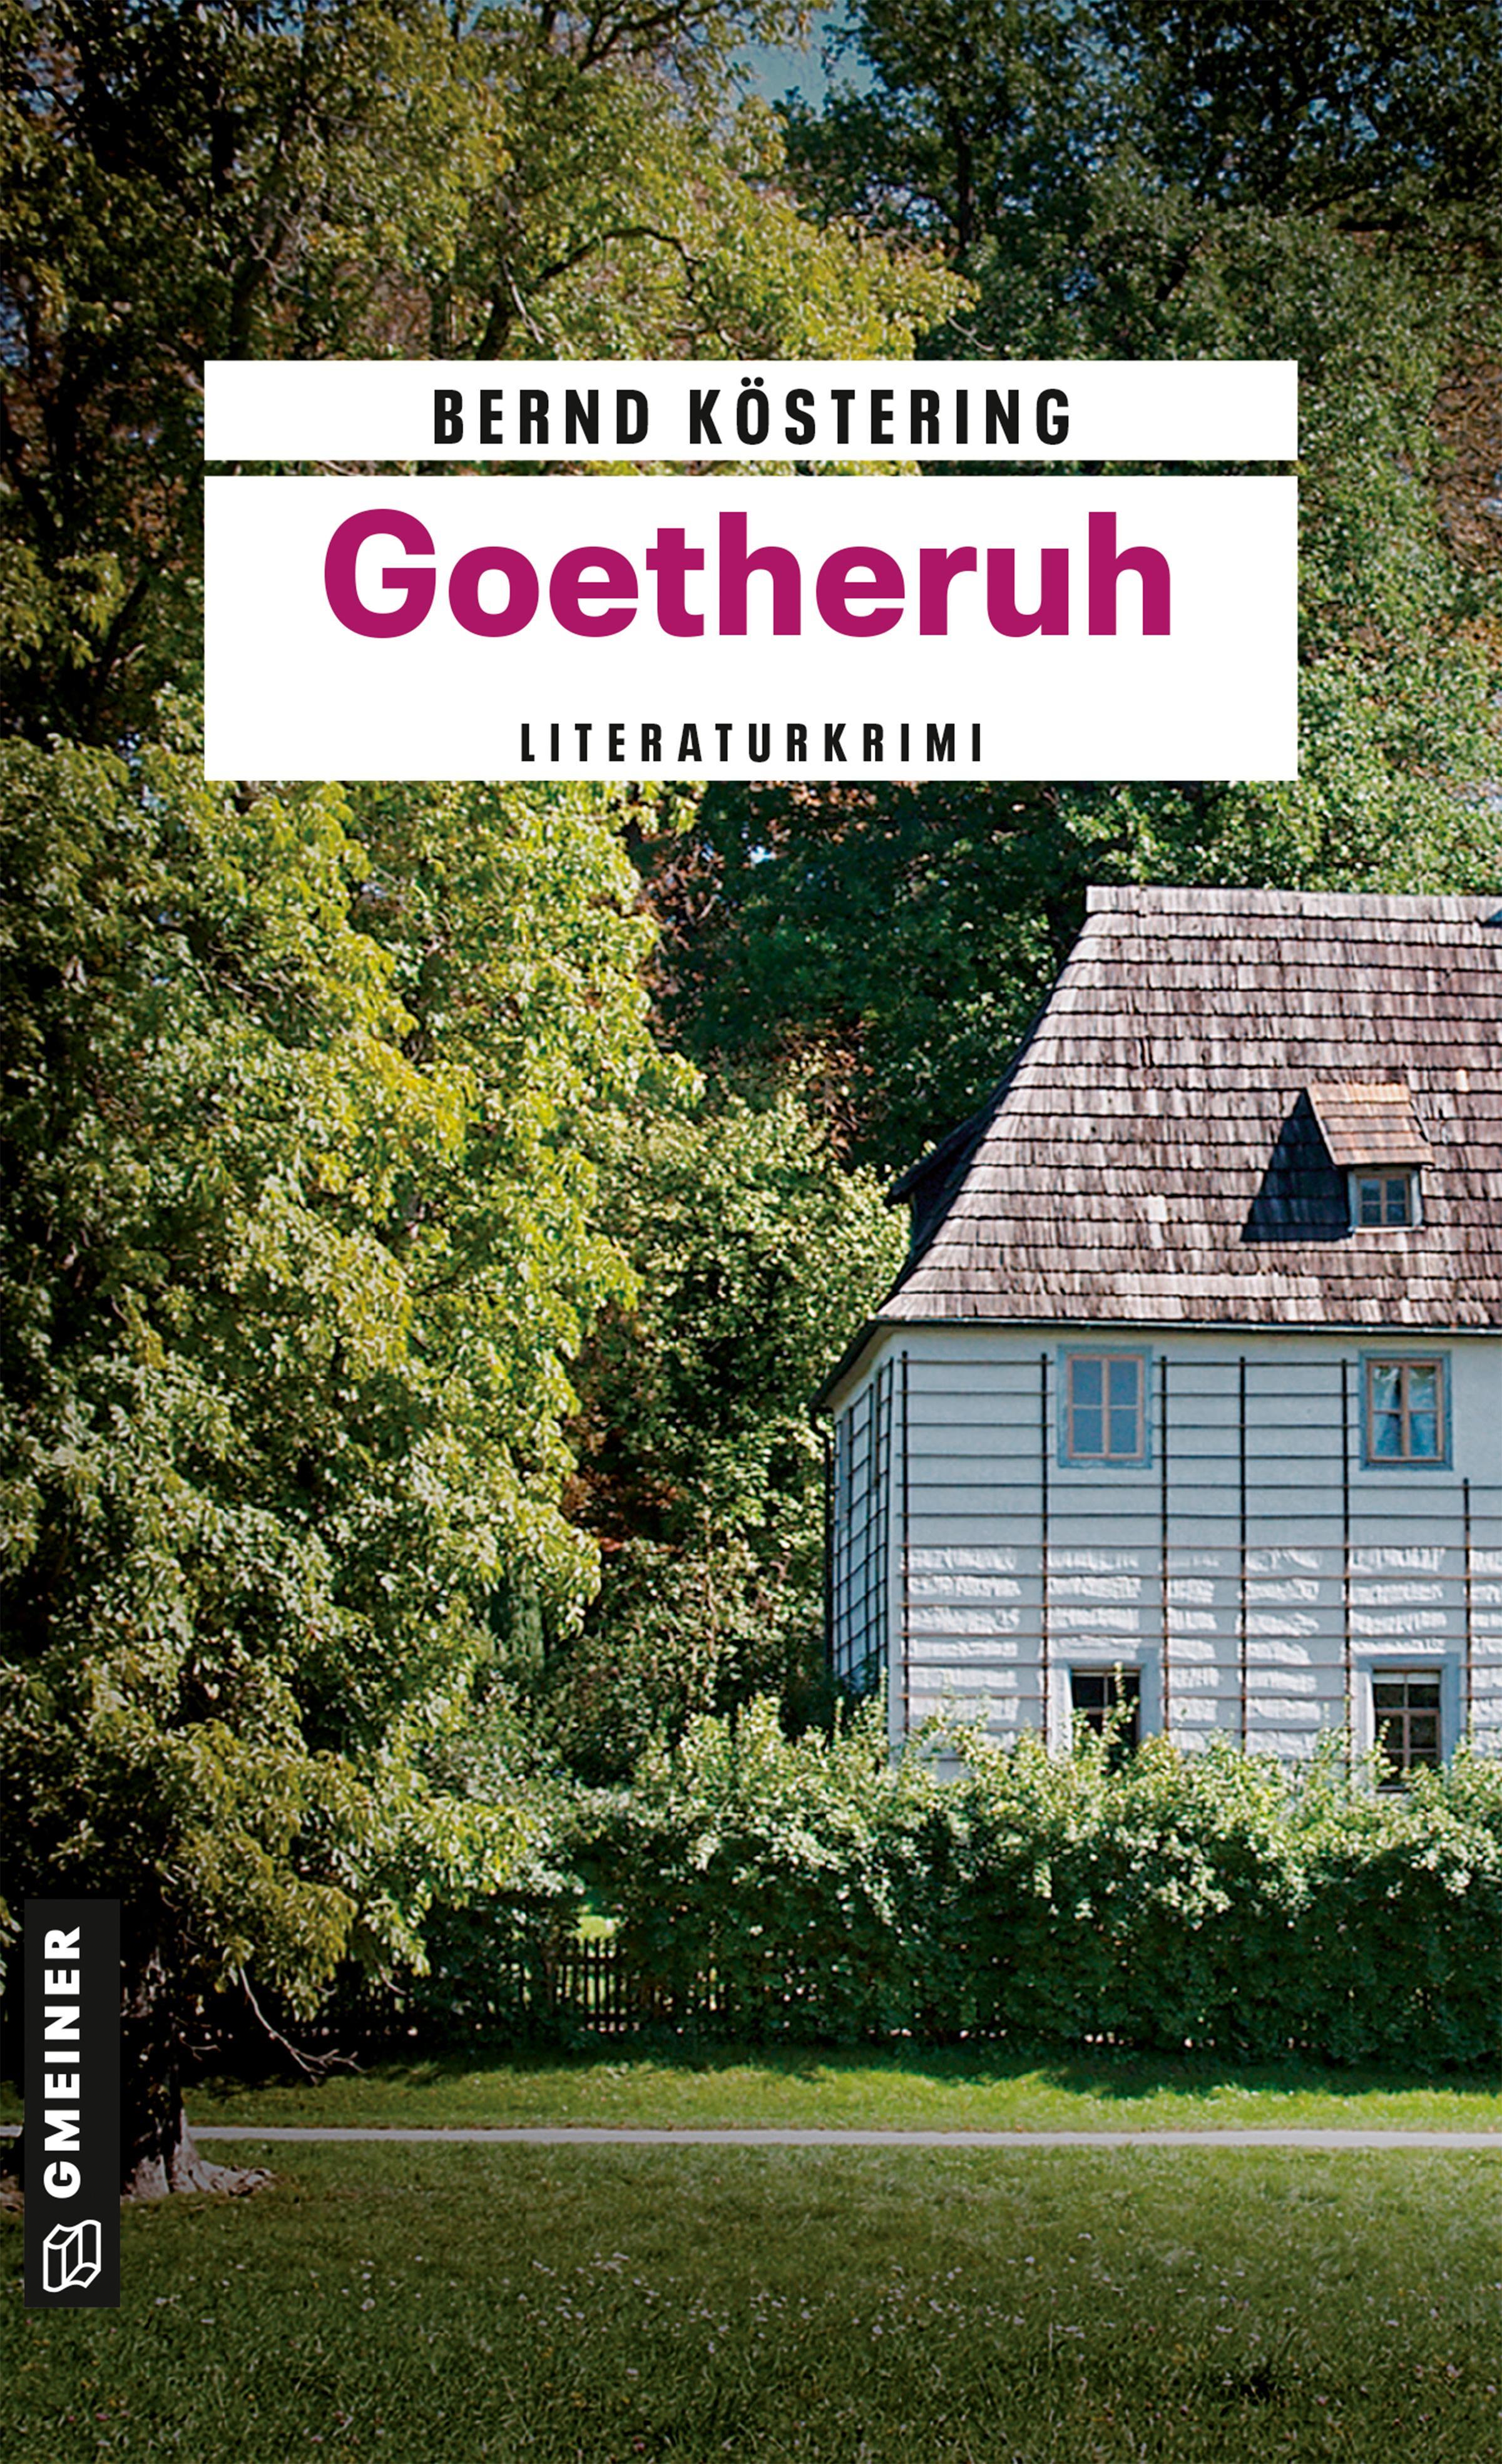 NEU-Goetheruh-Bernd-Koestering-210451